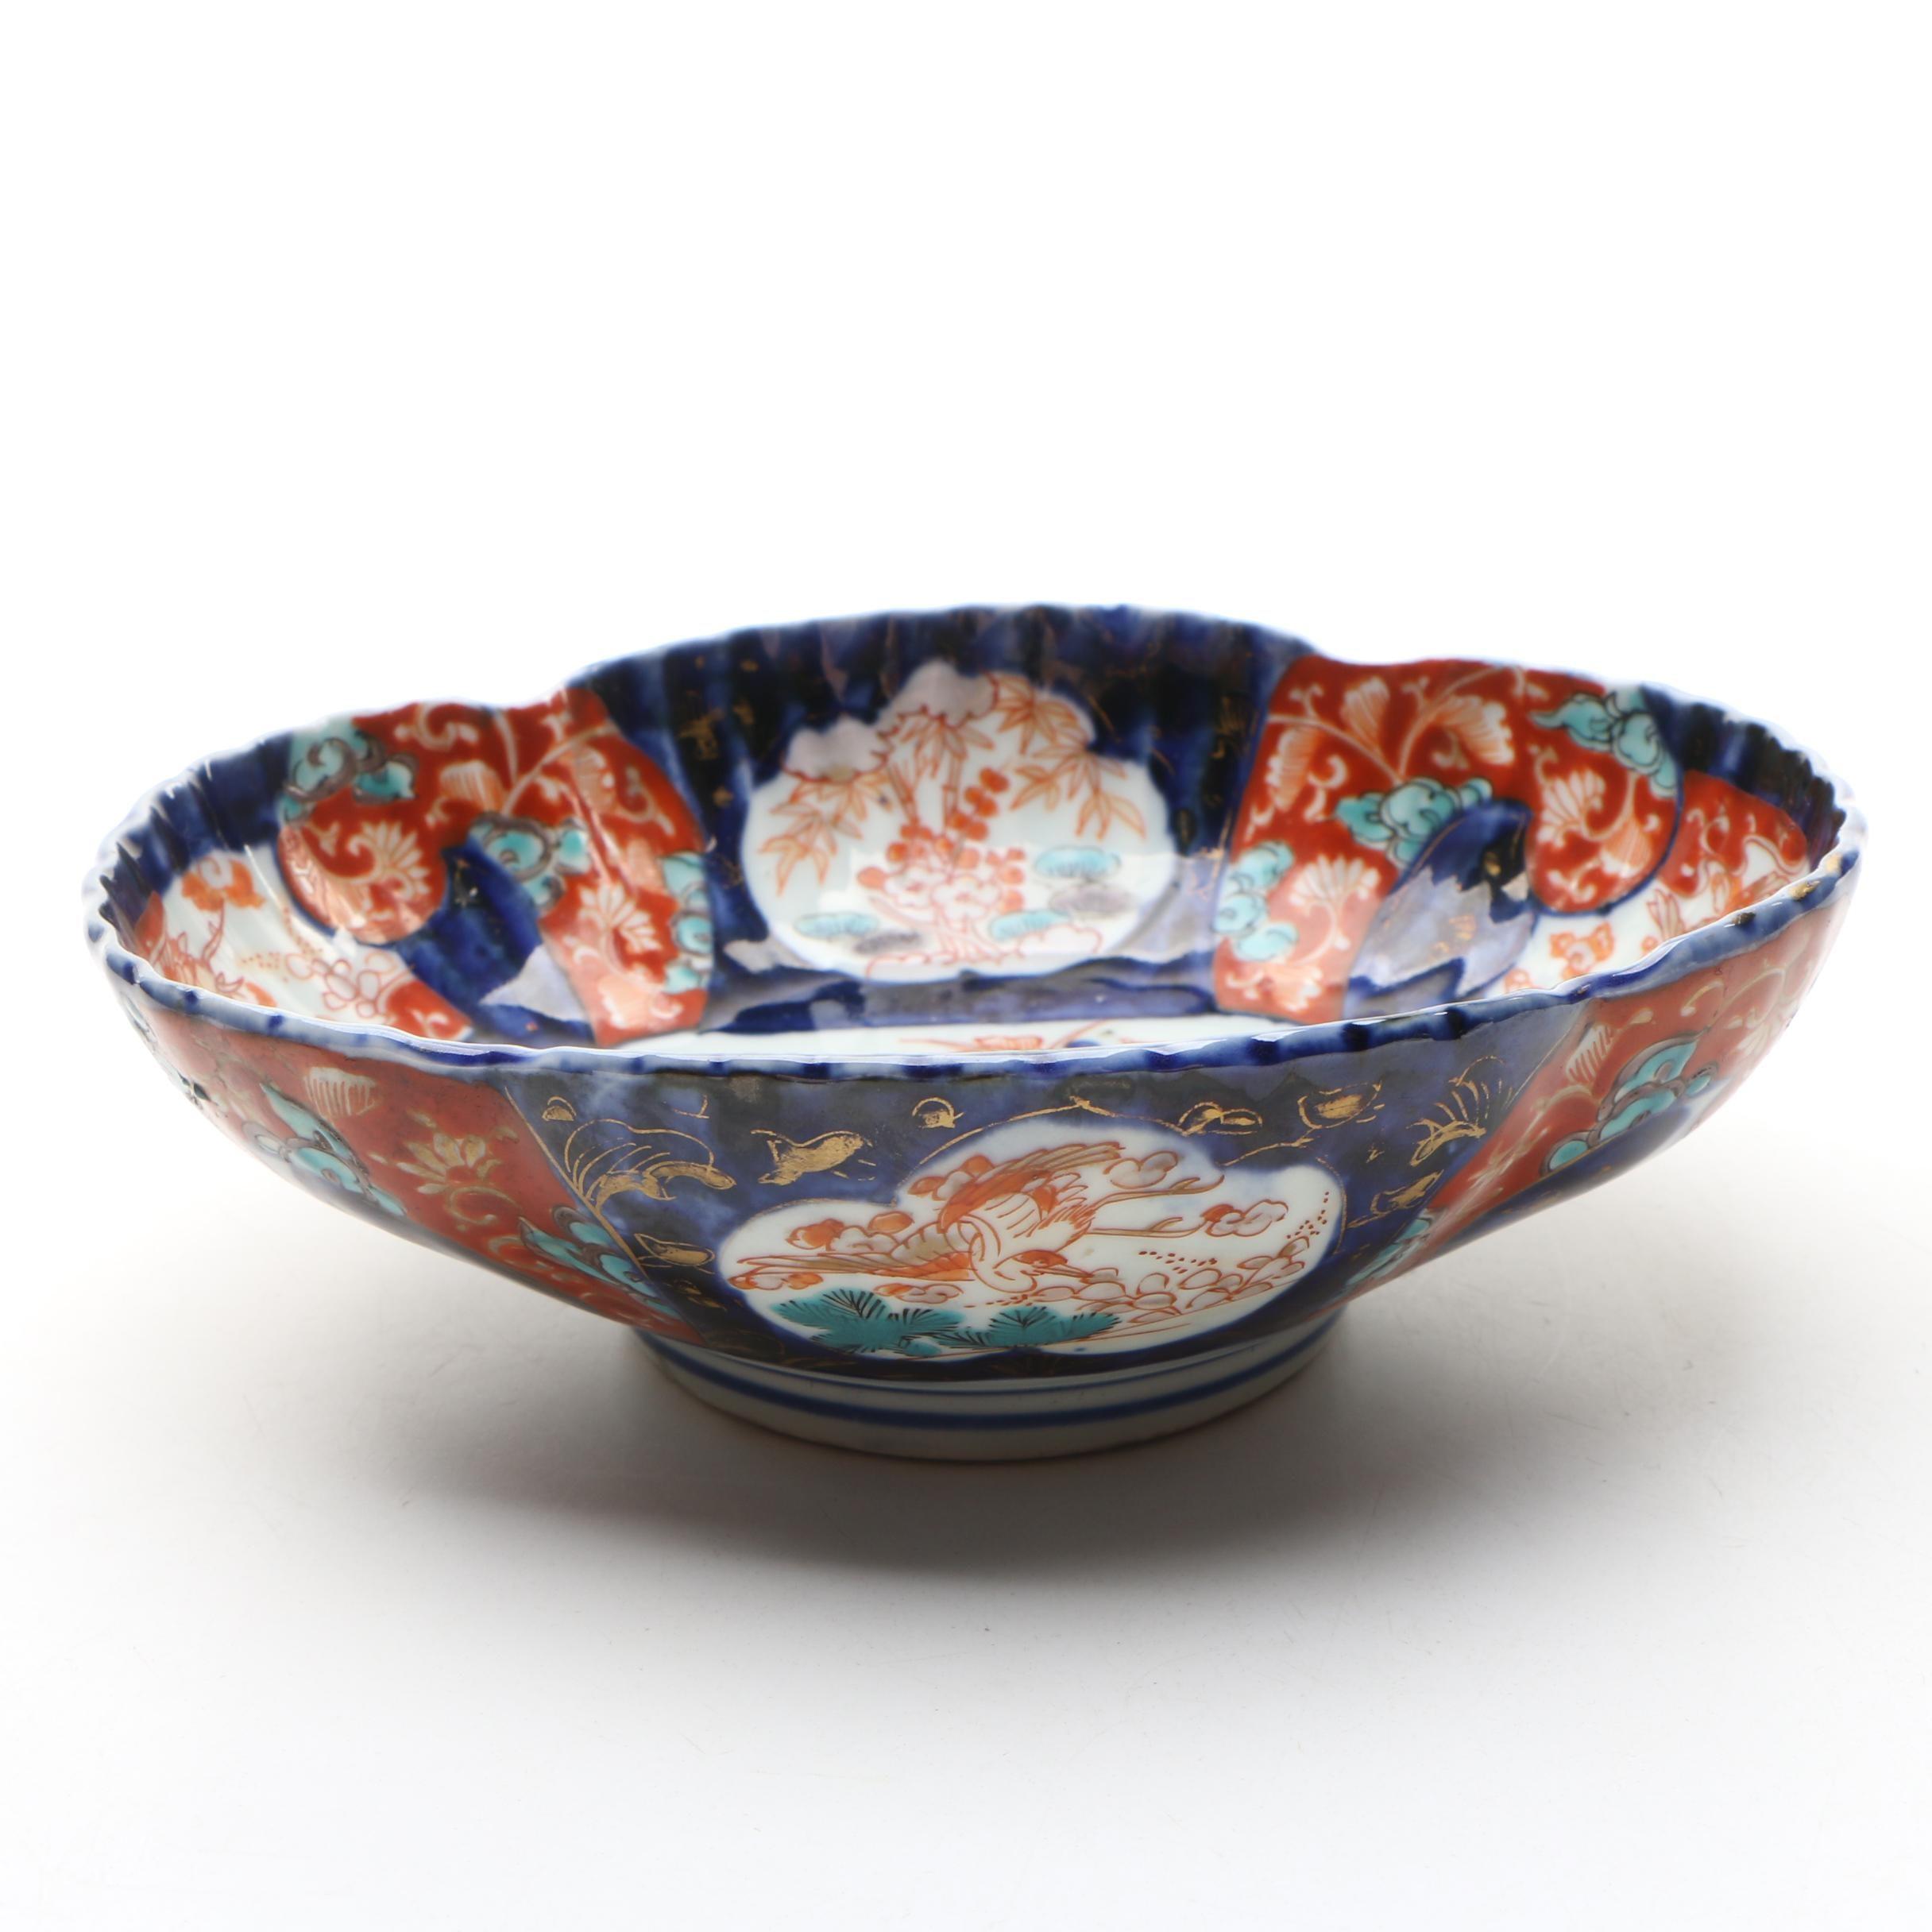 Japanese Imari Hand-Painted Porcelain Lobed Bowl with Scalloped Rim